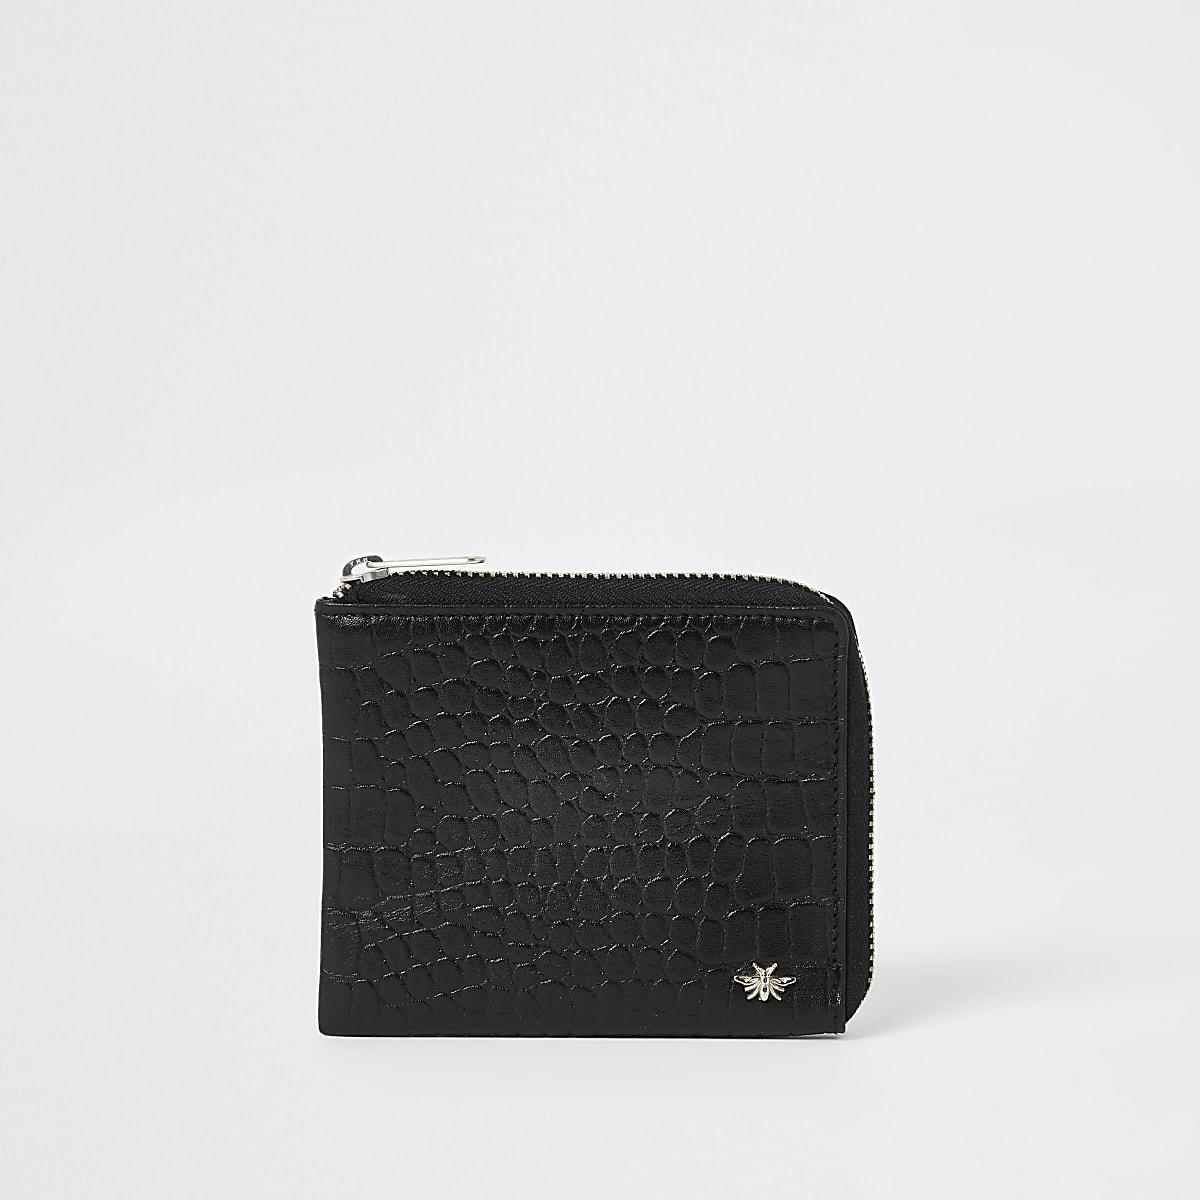 Black leather croc embossed zip wallet